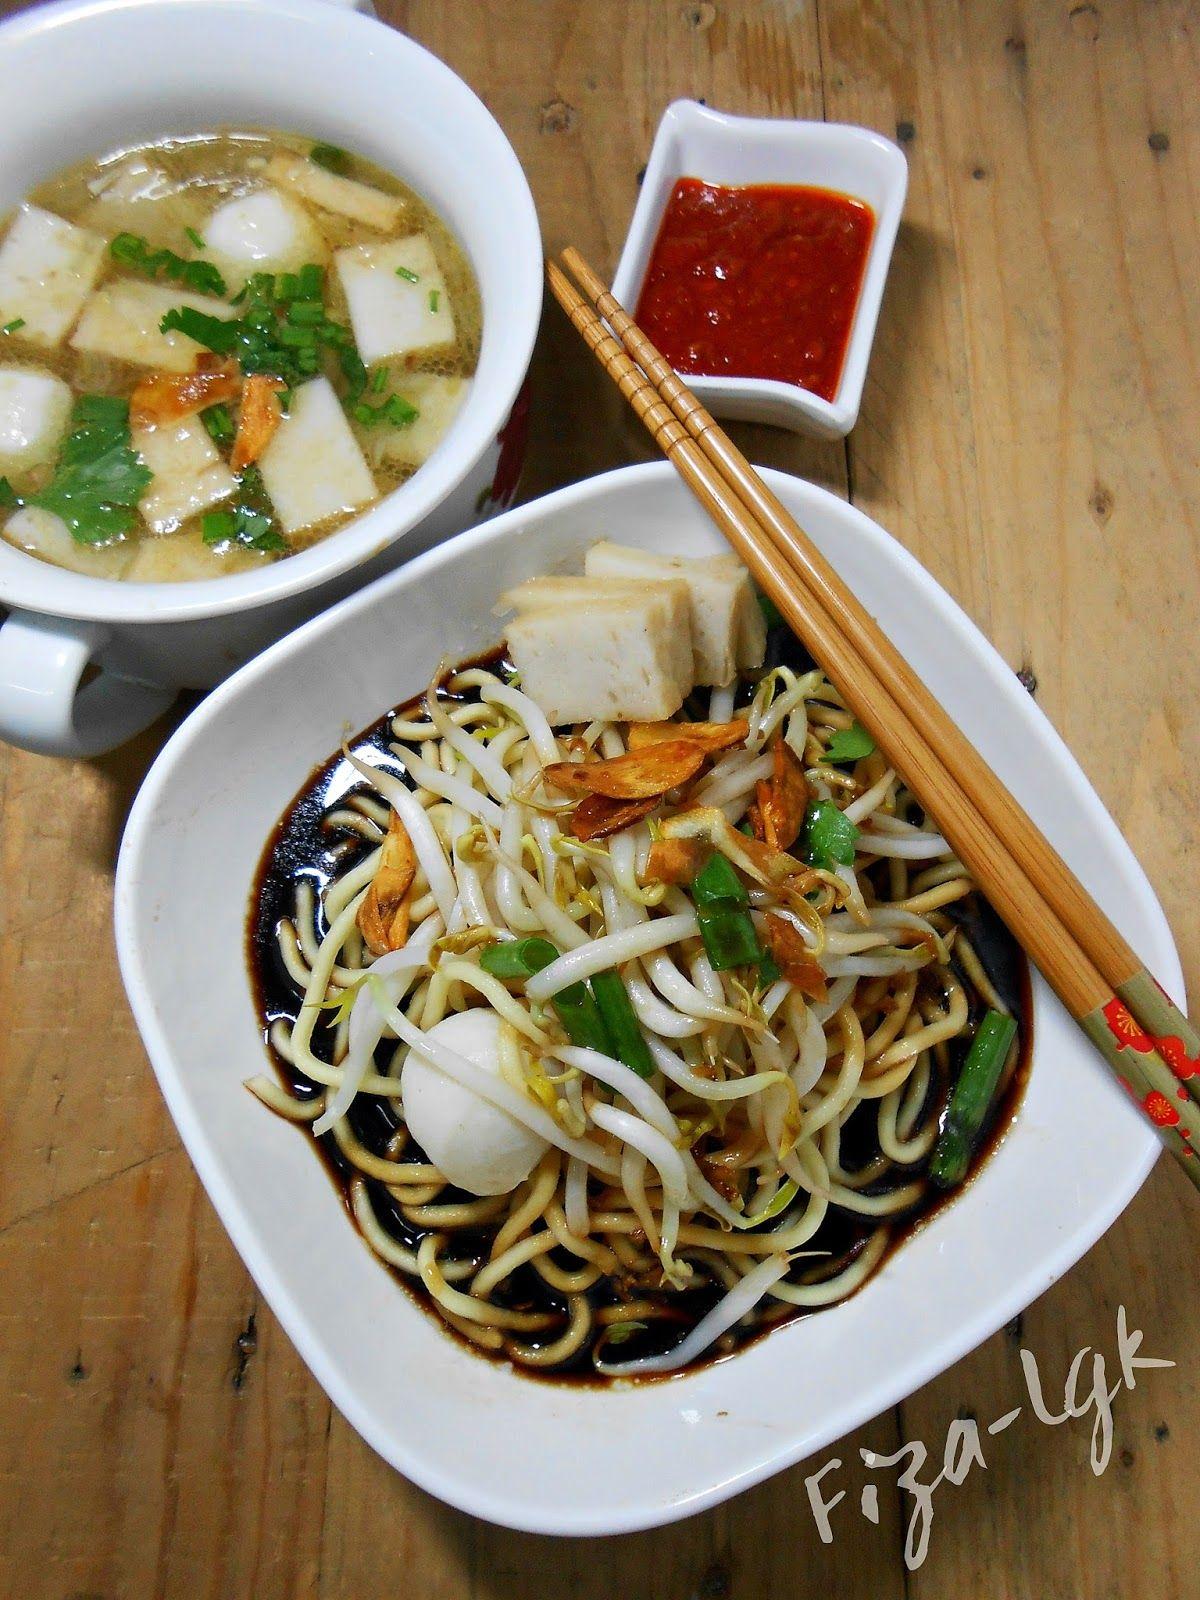 Blog Tentang Aneka Resepi Masakan Dan Perkongsian Cara Memasak Langkah Demi Langkah Resep Masakan Asia Resep Masakan Sarapan